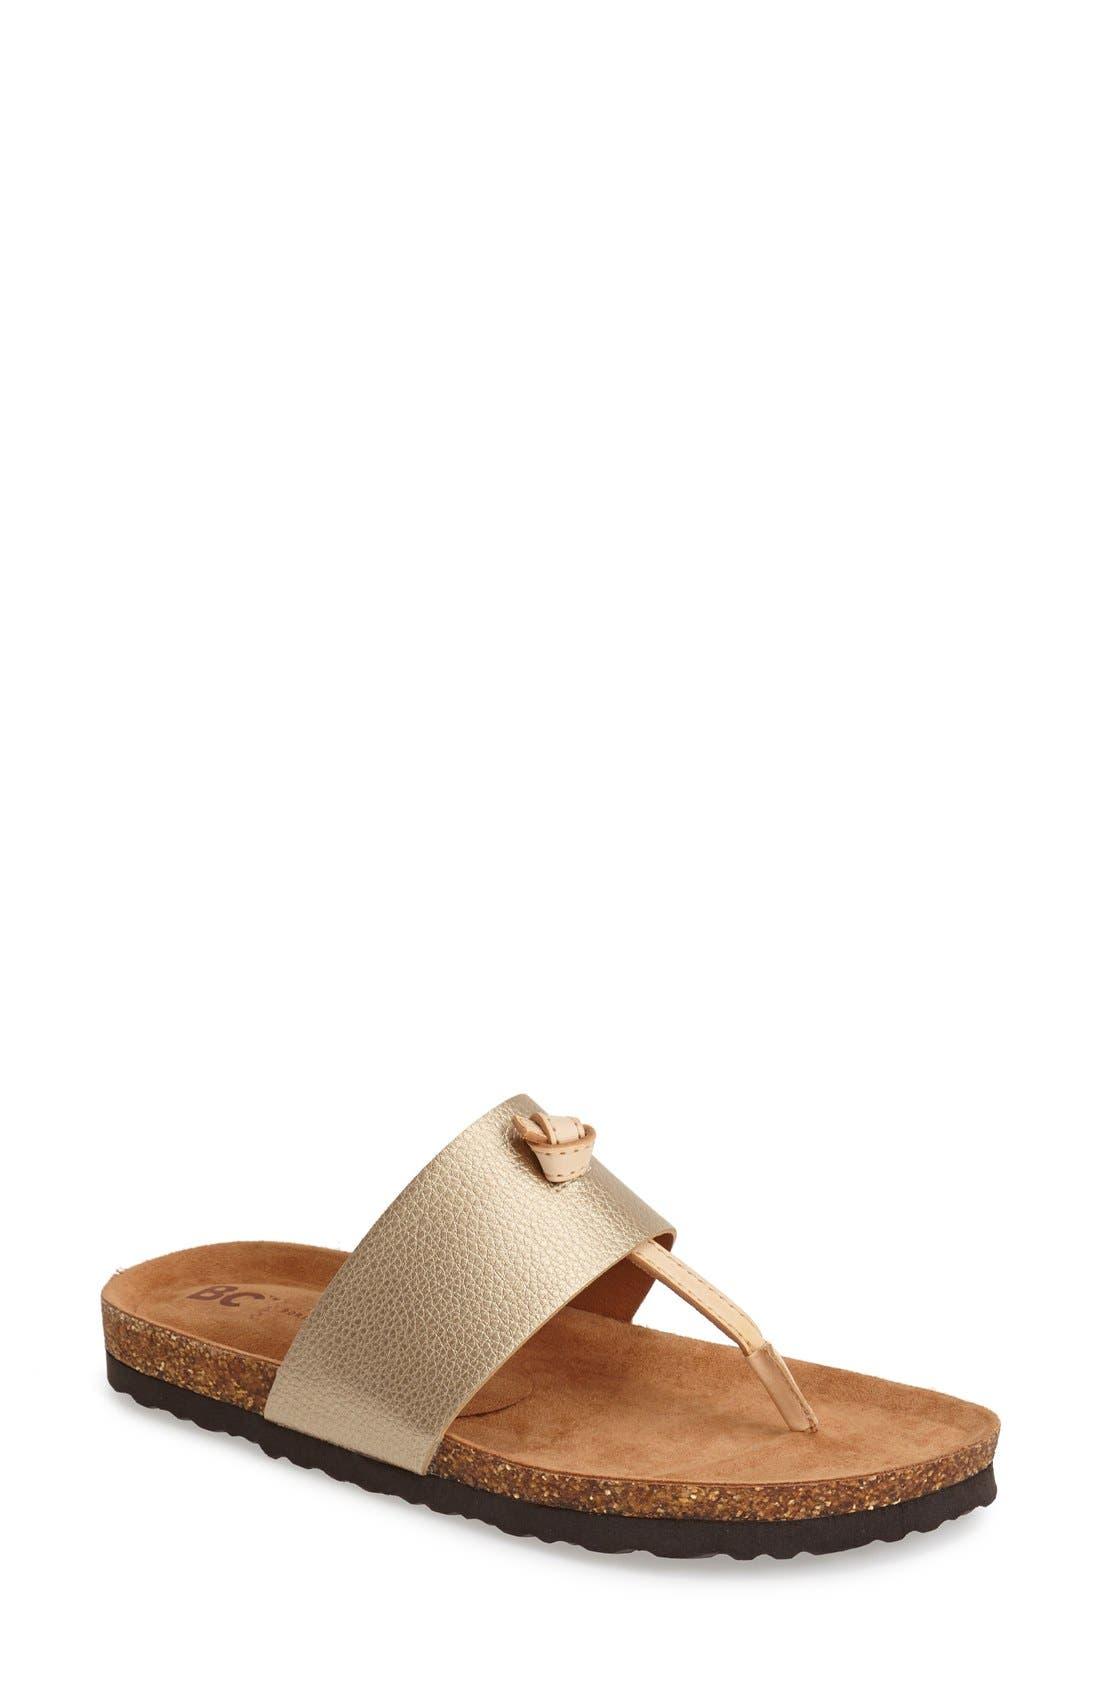 Main Image - BC Footwear 'Lynx' Faux Leather Thong Sandal (Women)